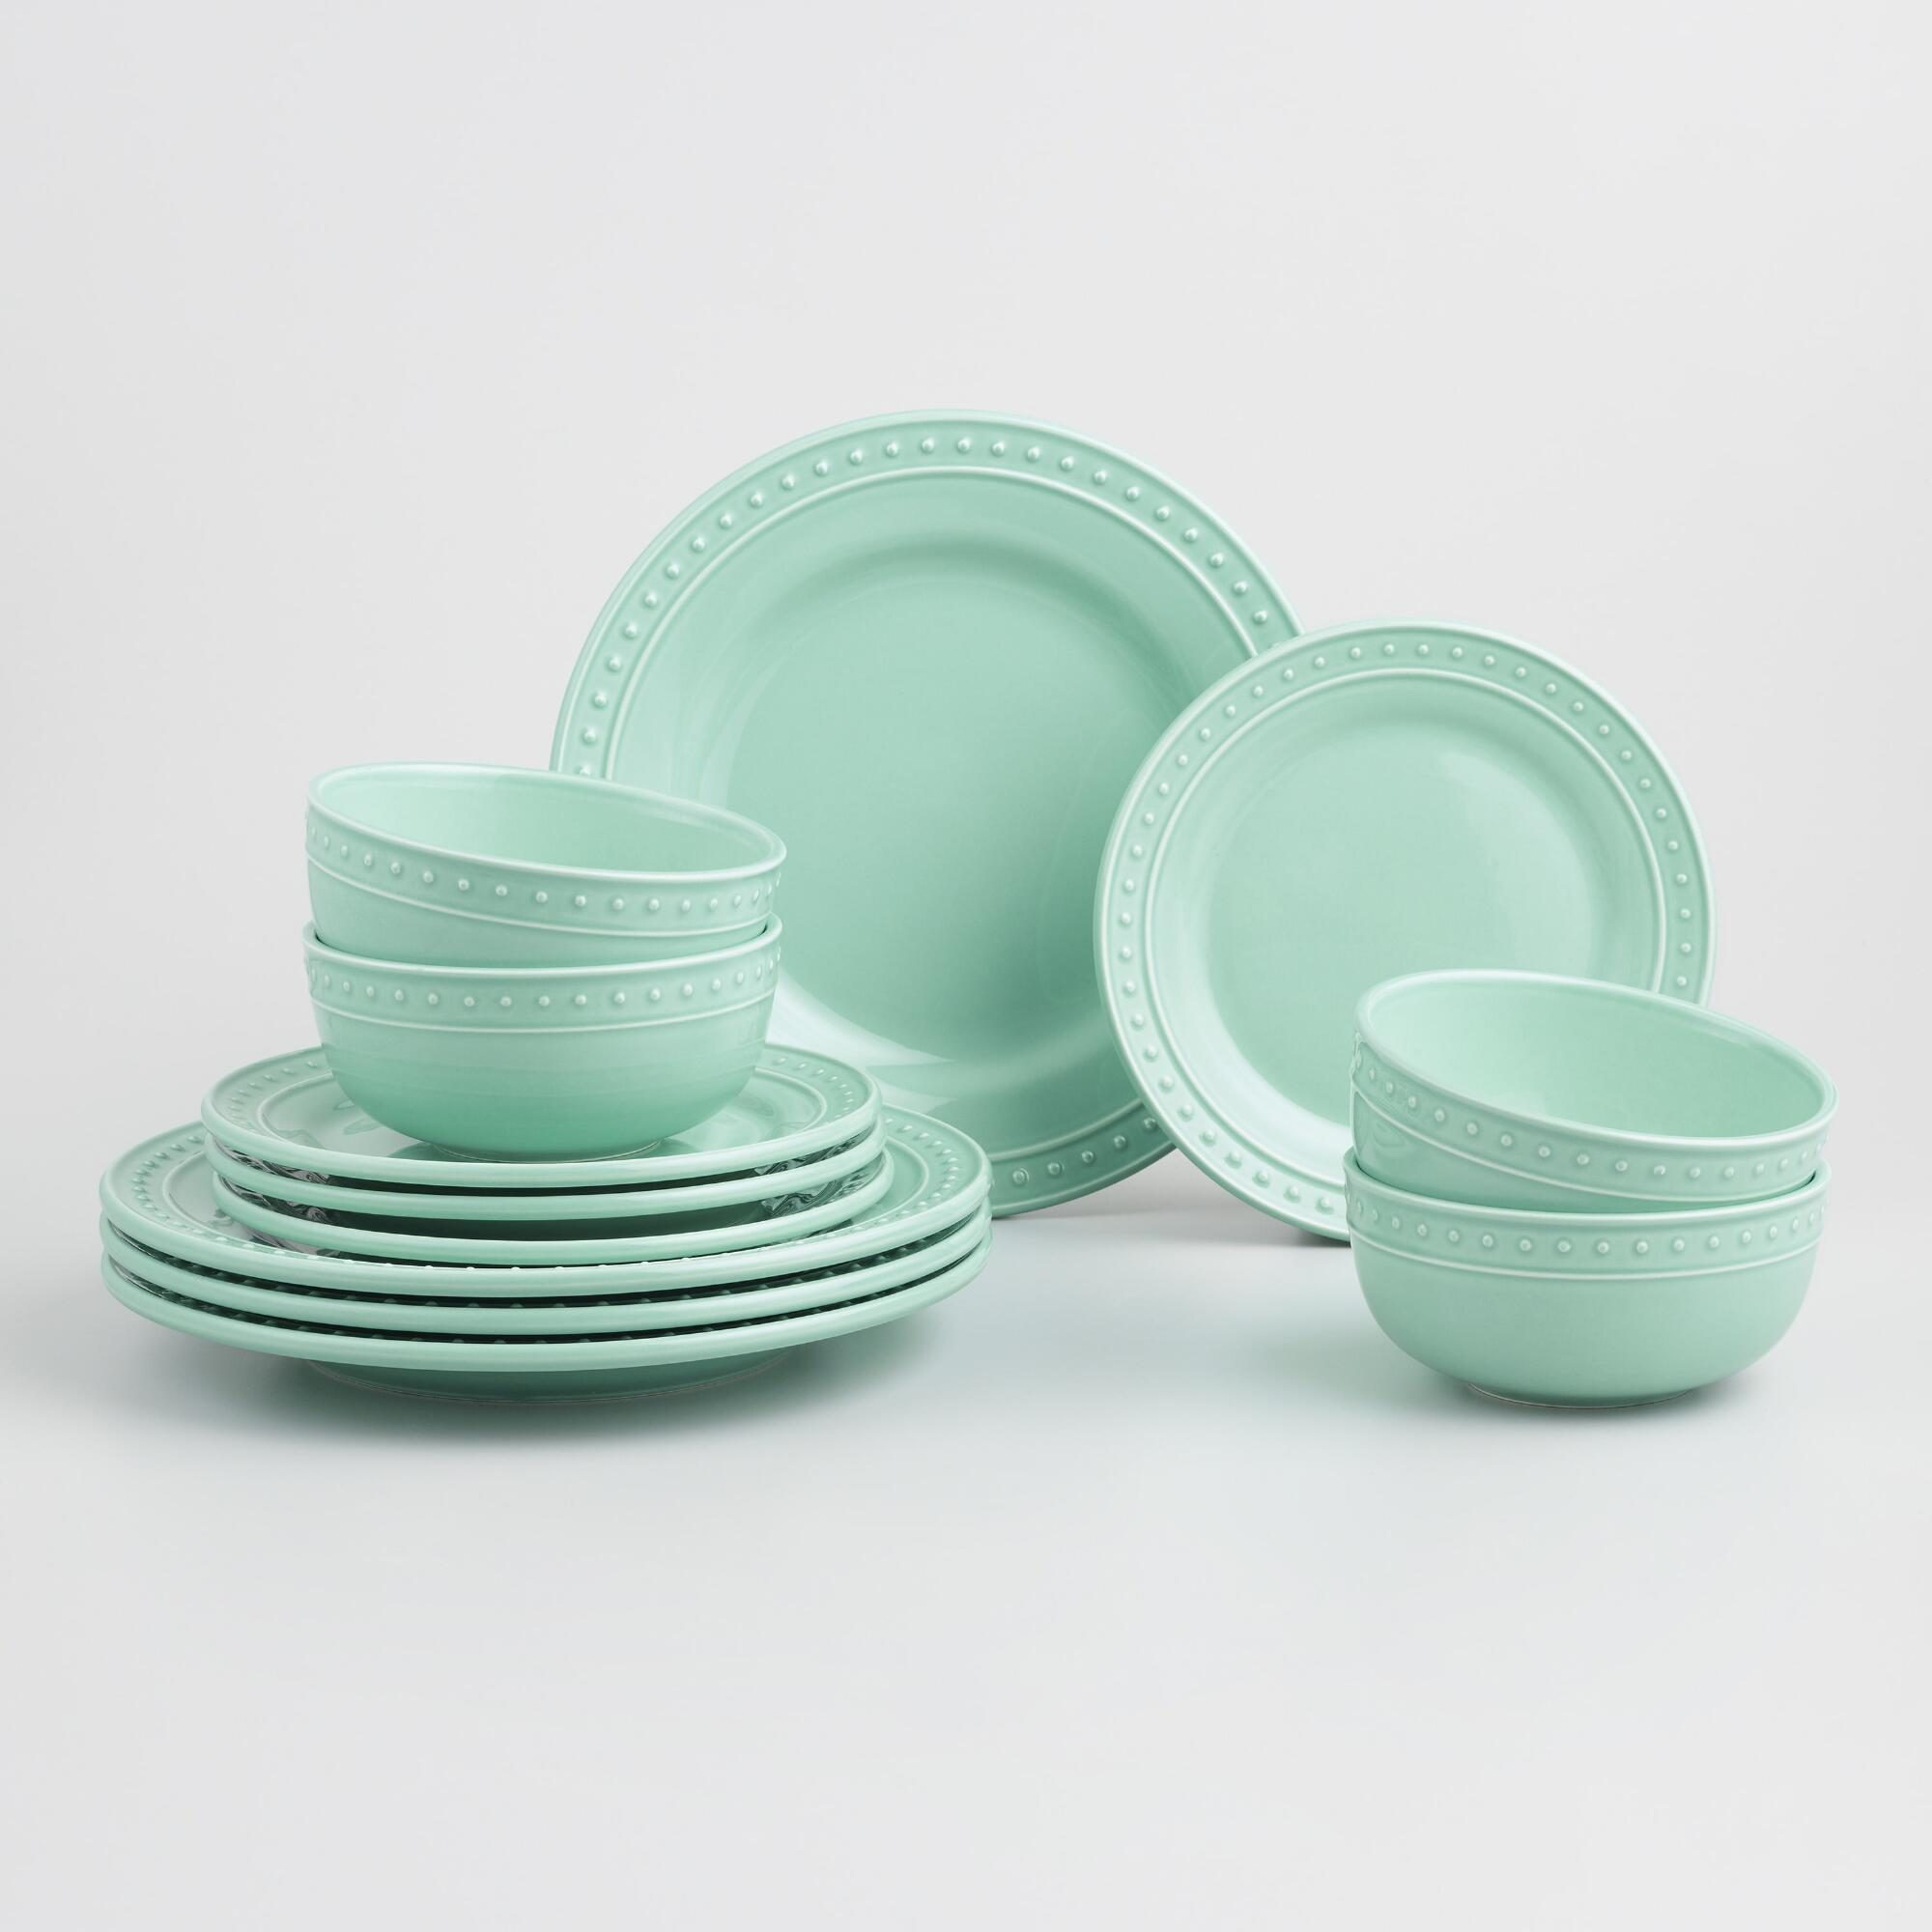 Aqua Nantucket Dinnerware 12 Piece Set by World Market